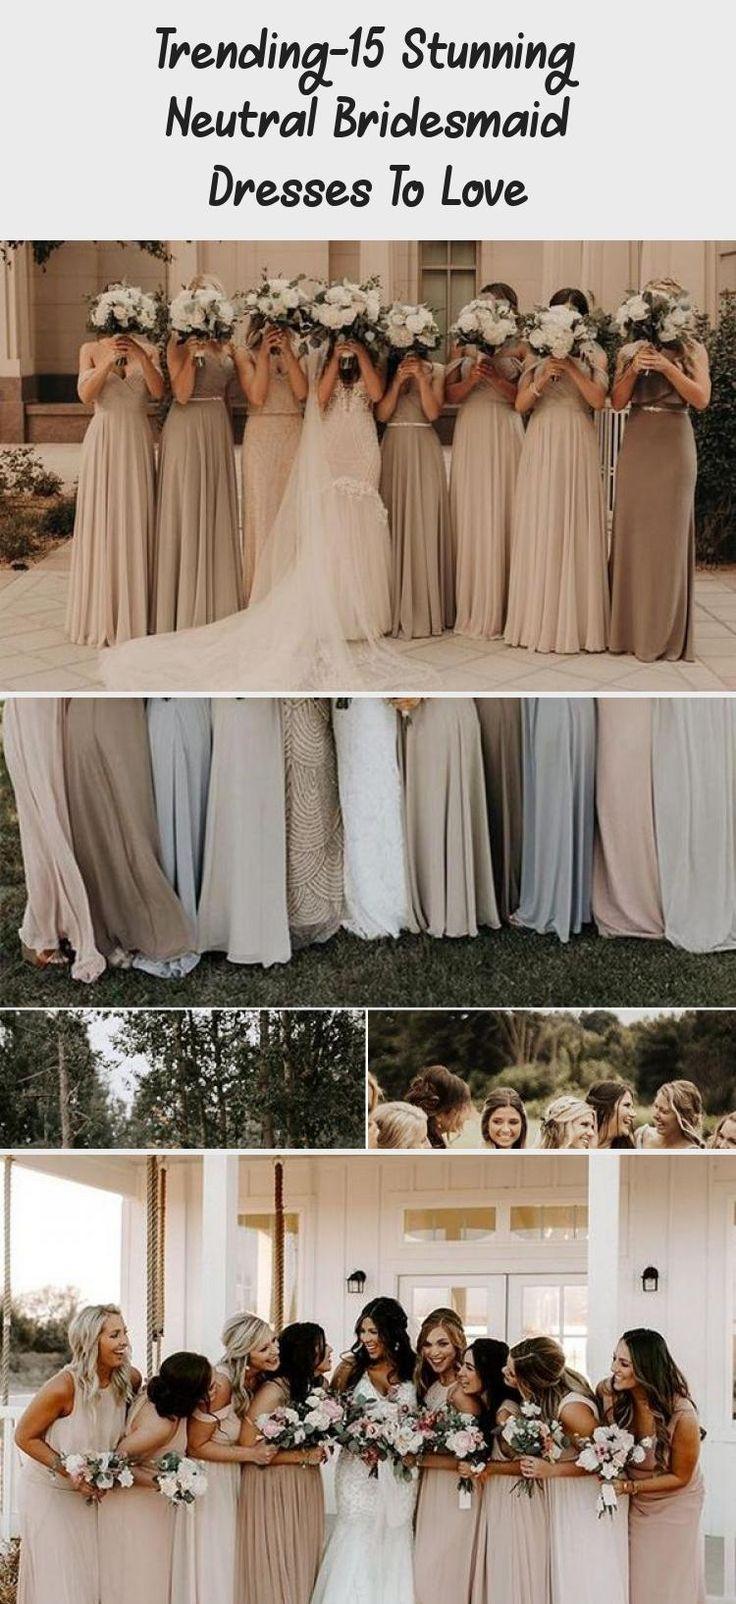 neutral champagne bridesmaid dresses #obde #weddingideas2019 #GreyBridesmaidDresses #OffTheShoulderBridesmaidDresses #AfricanBridesmaidDresses #LavenderBridesmaidDresses #BlackBridesmaidDresses